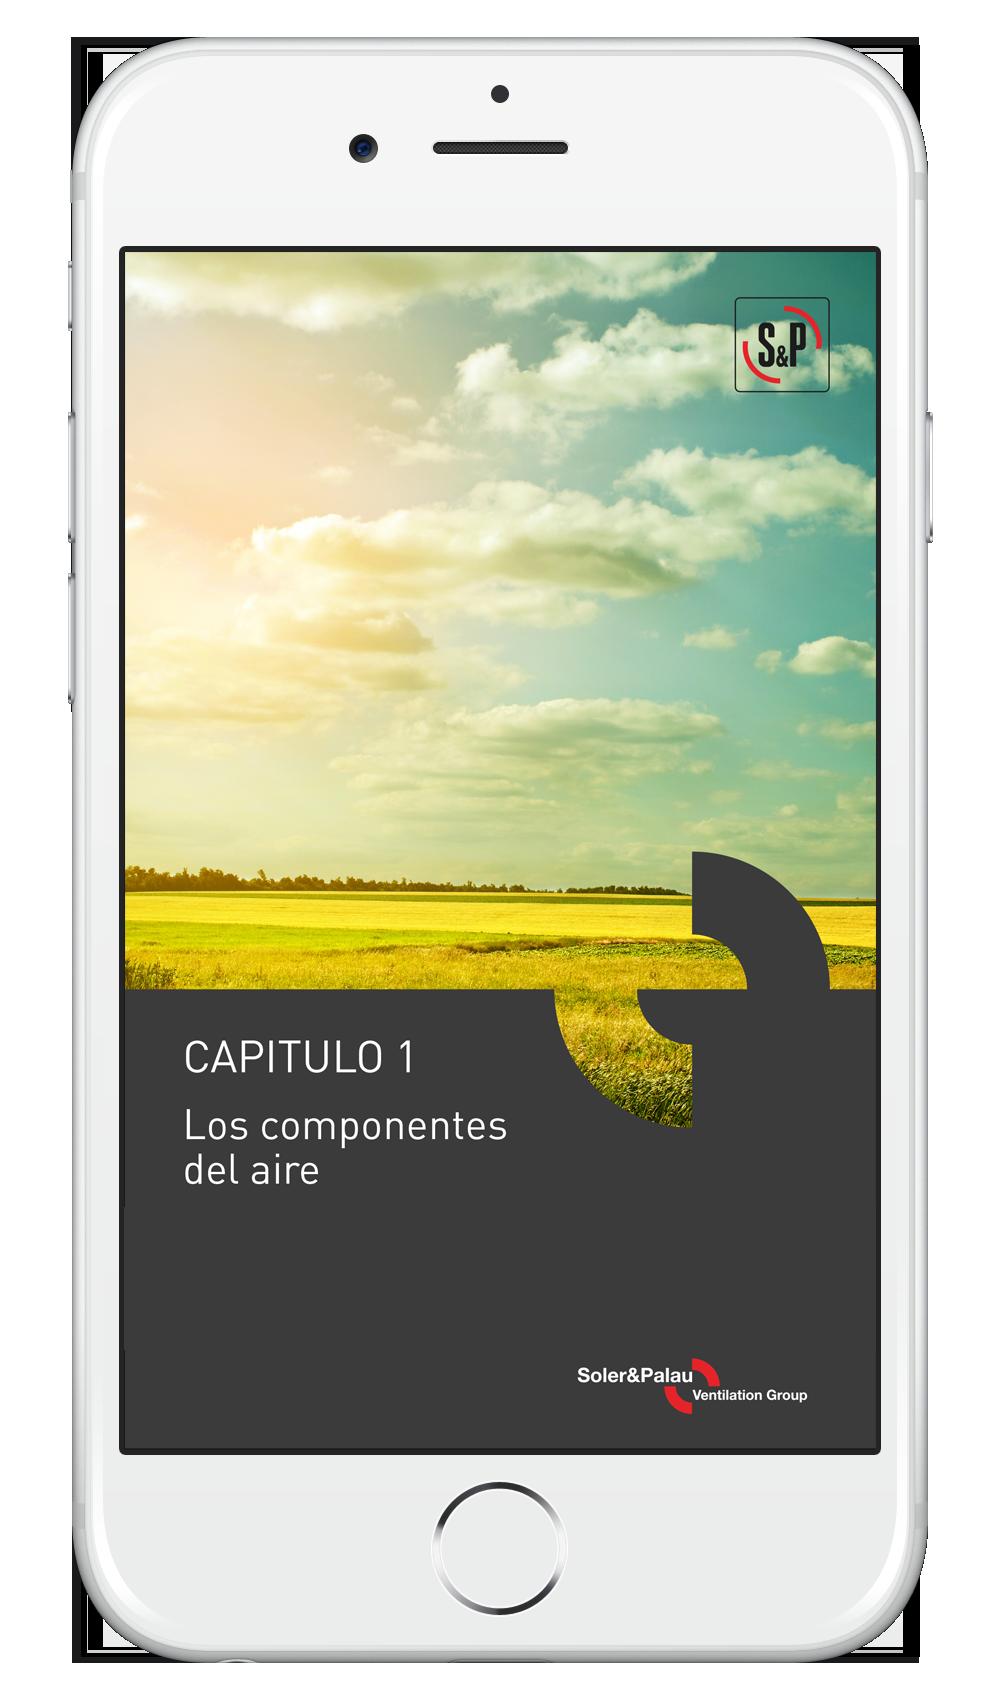 SPA_Mobil_sencer_Componentes_Aire.png